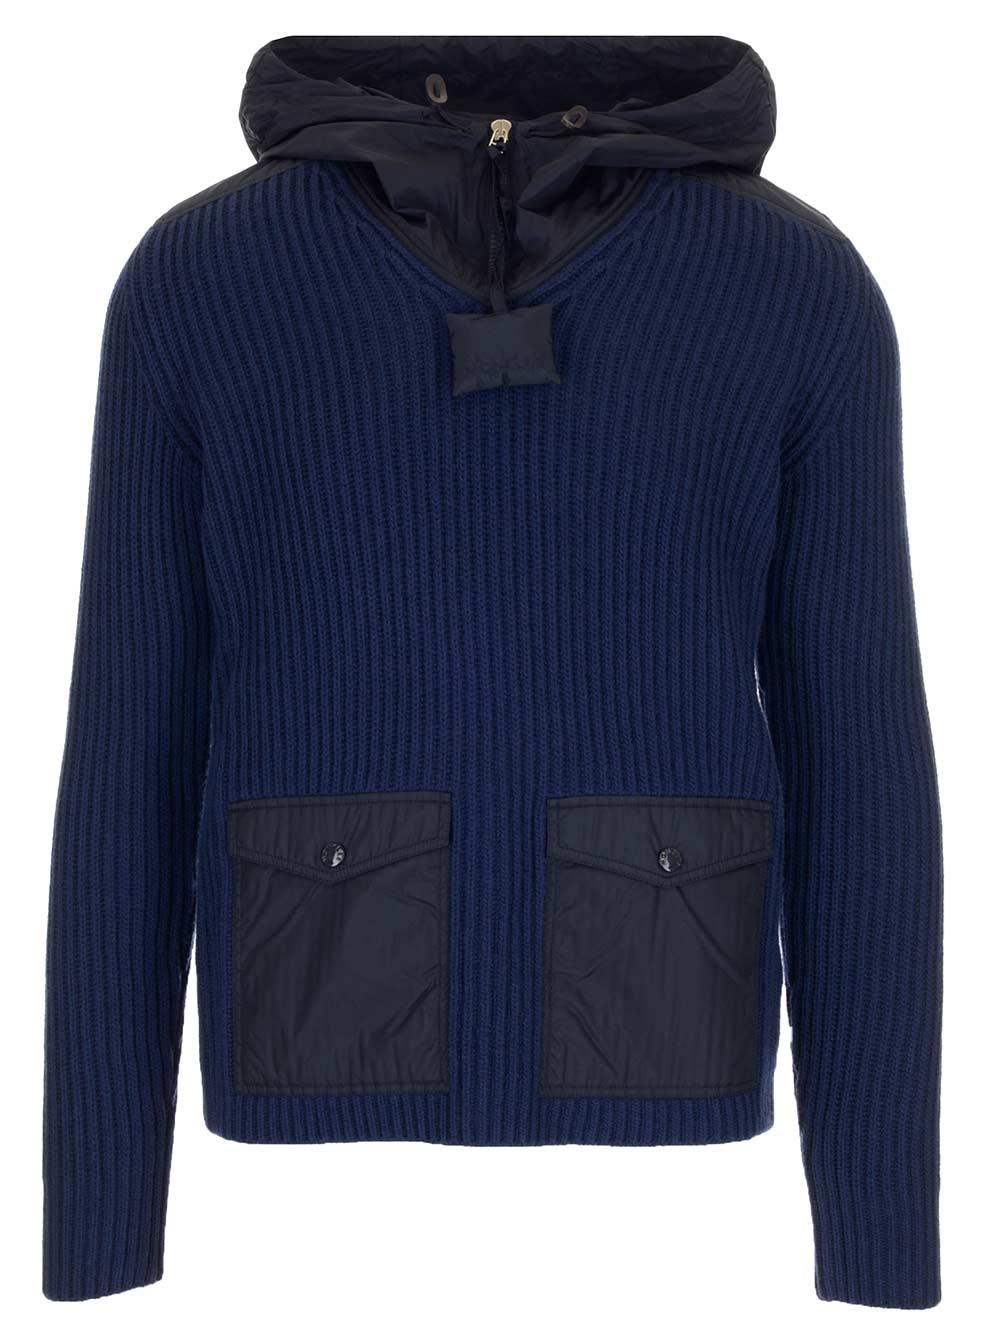 MONCLER GENIUS 1 Moncler Jw Anderson Knit Sweater